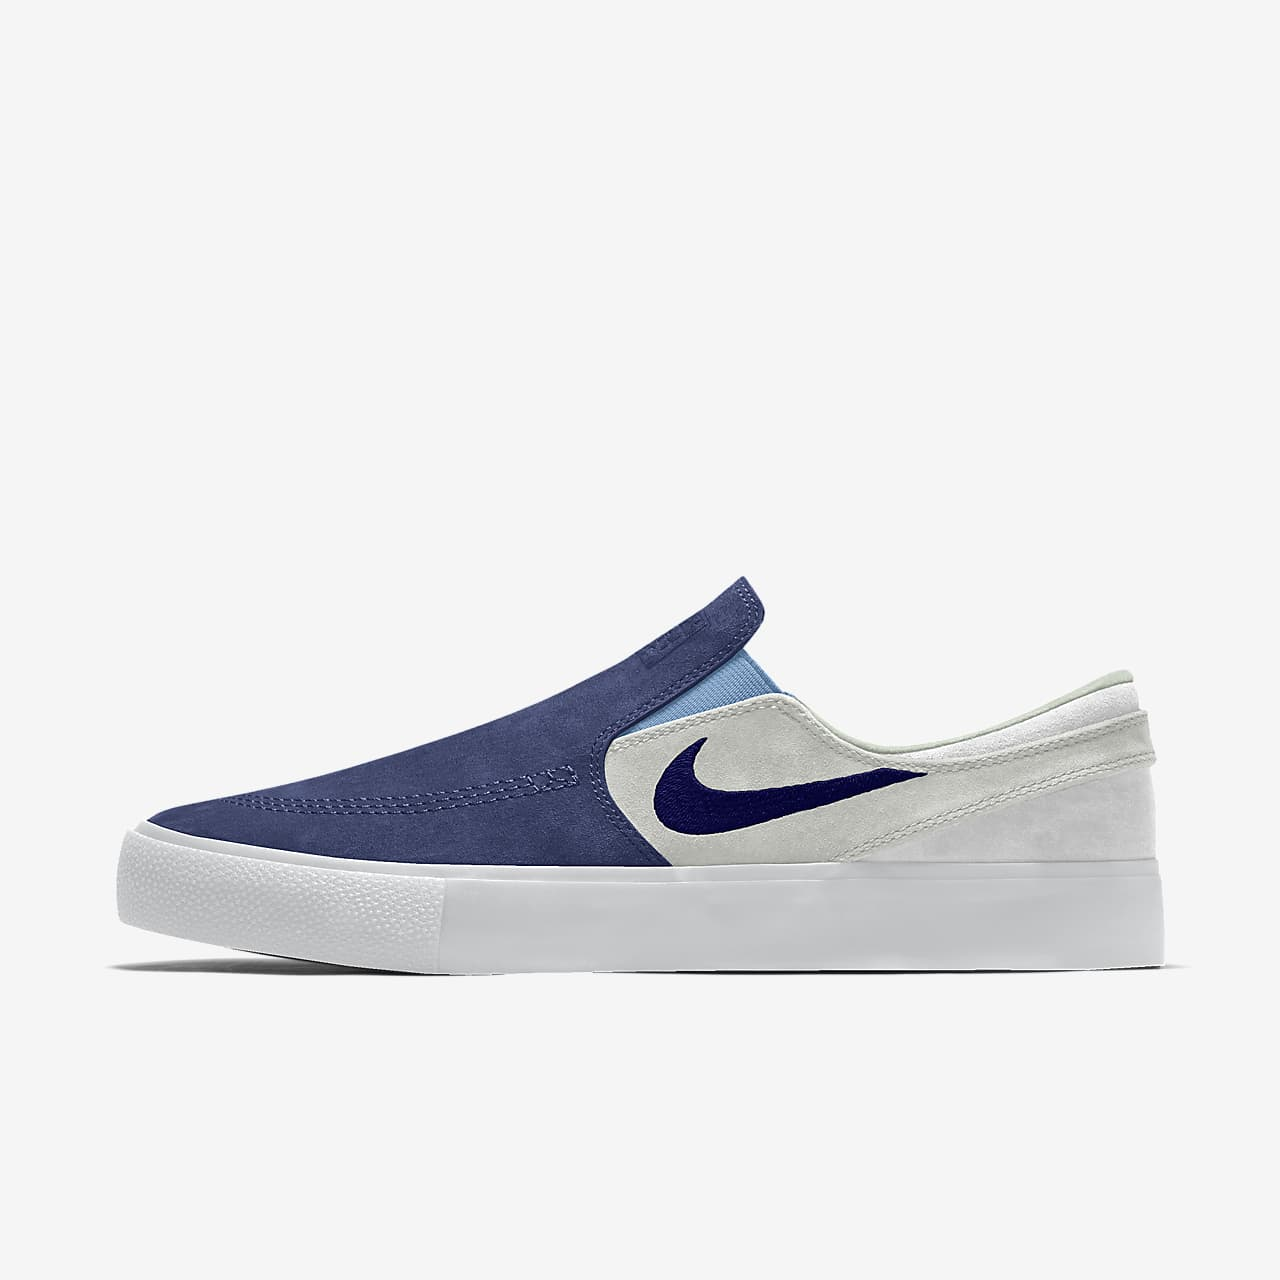 Chaussure de skateboard personnalisable Nike SB Zoom Janoski RM By You